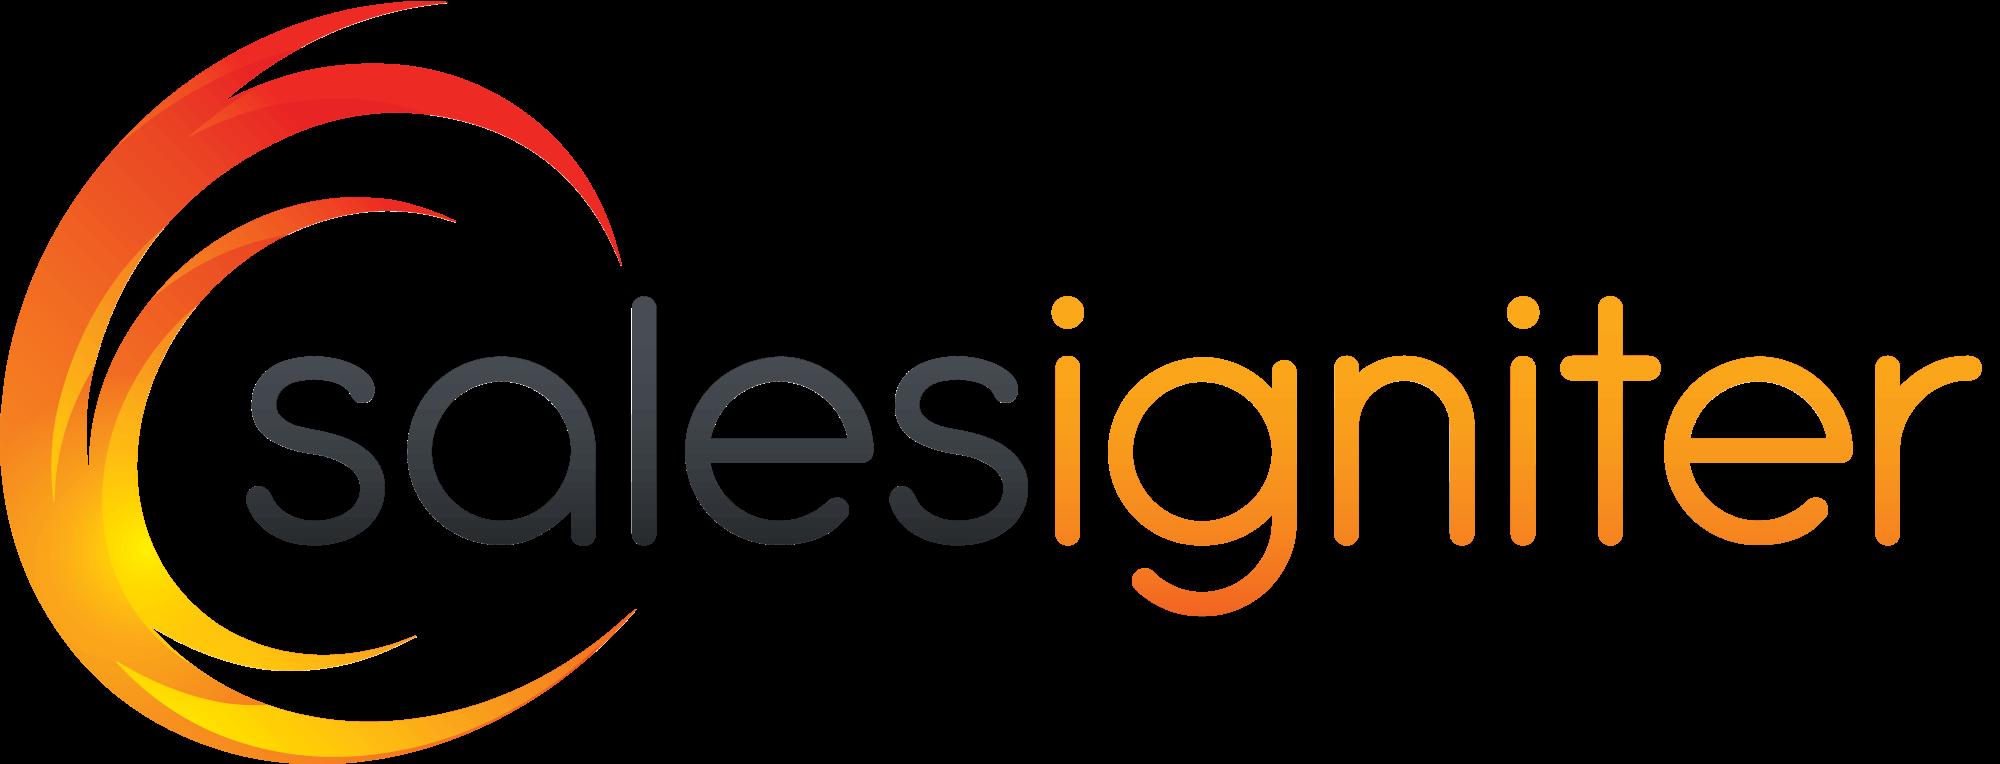 Sales Igniter Rental Software Coupons & Promo codes